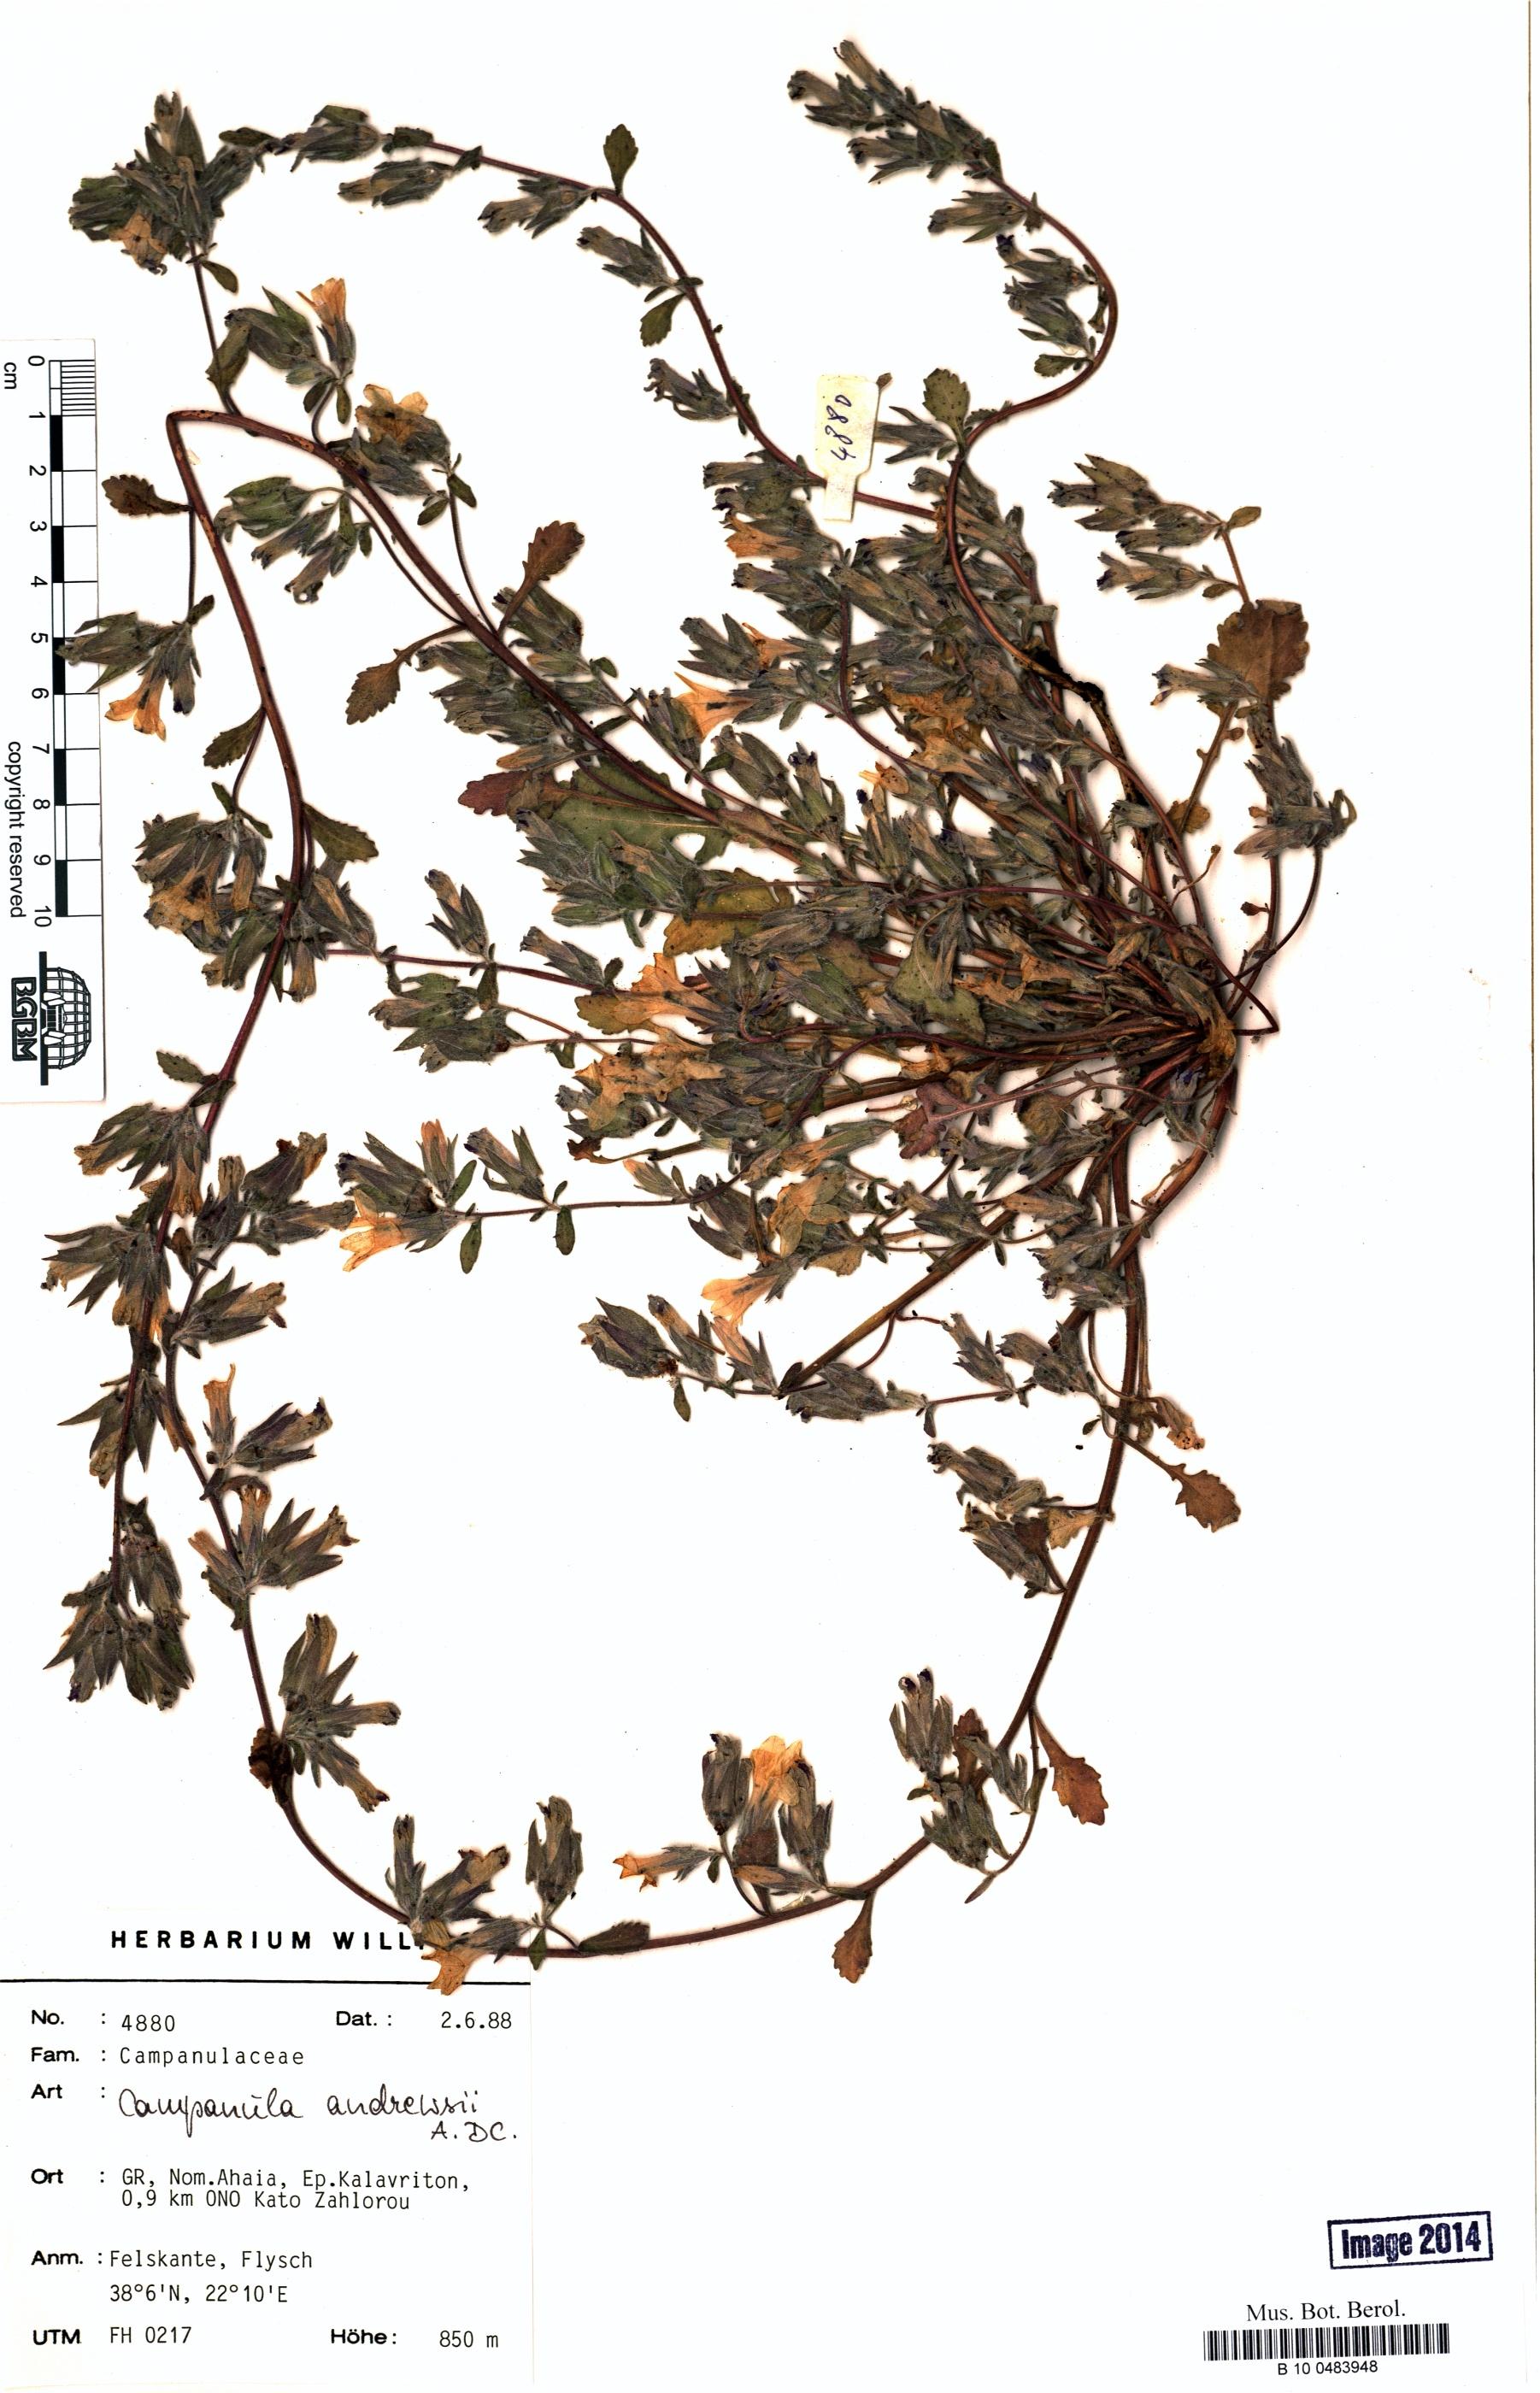 http://ww2.bgbm.org/herbarium/images/B/10/04/83/94/B_10_0483948.jpg